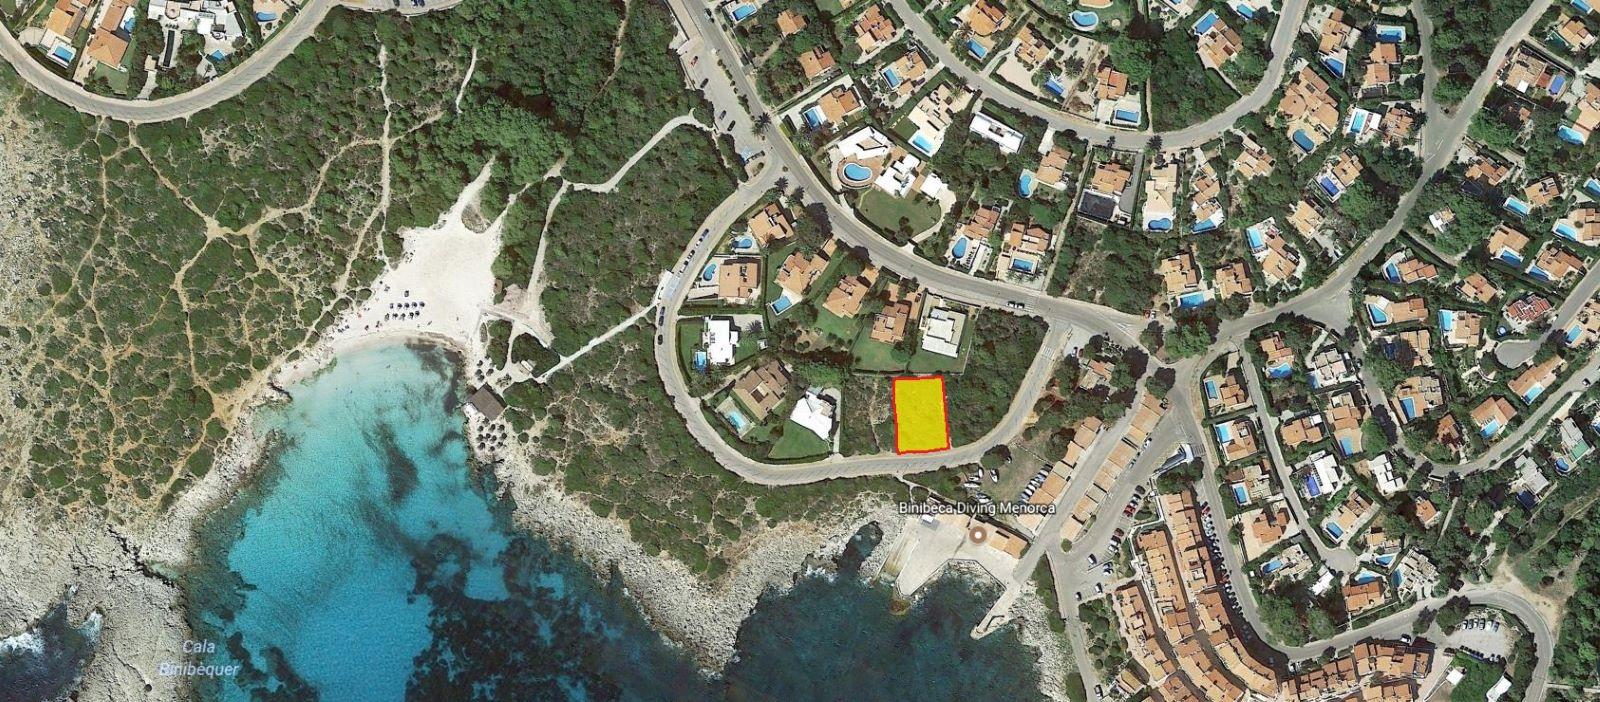 Terrain près de la mer en vente à Binibeca Nou